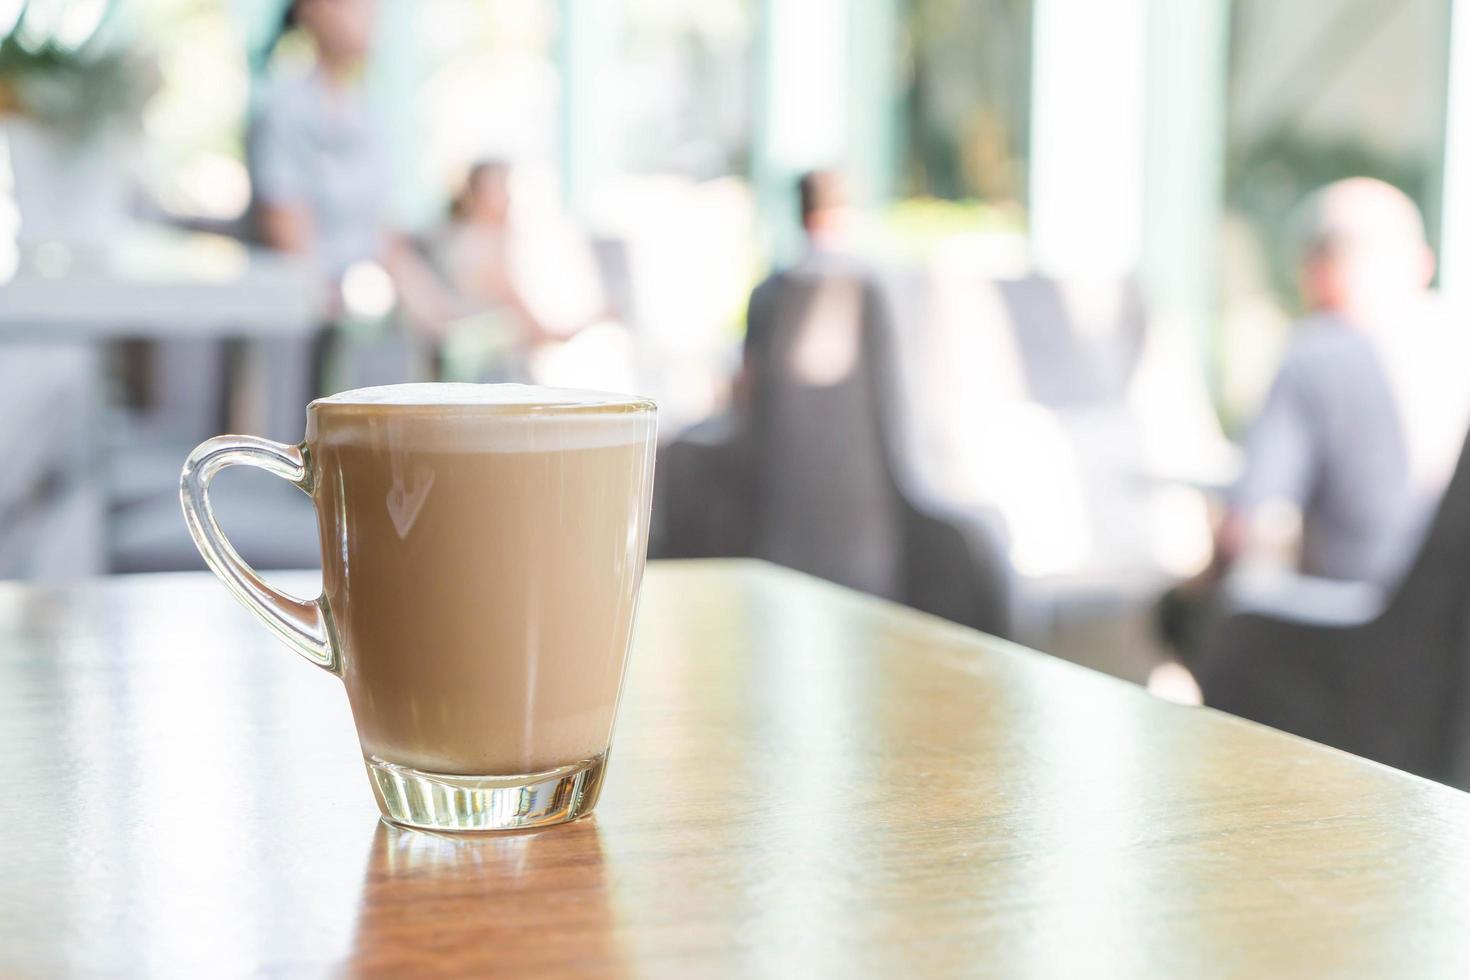 taza de café con leche caliente foto